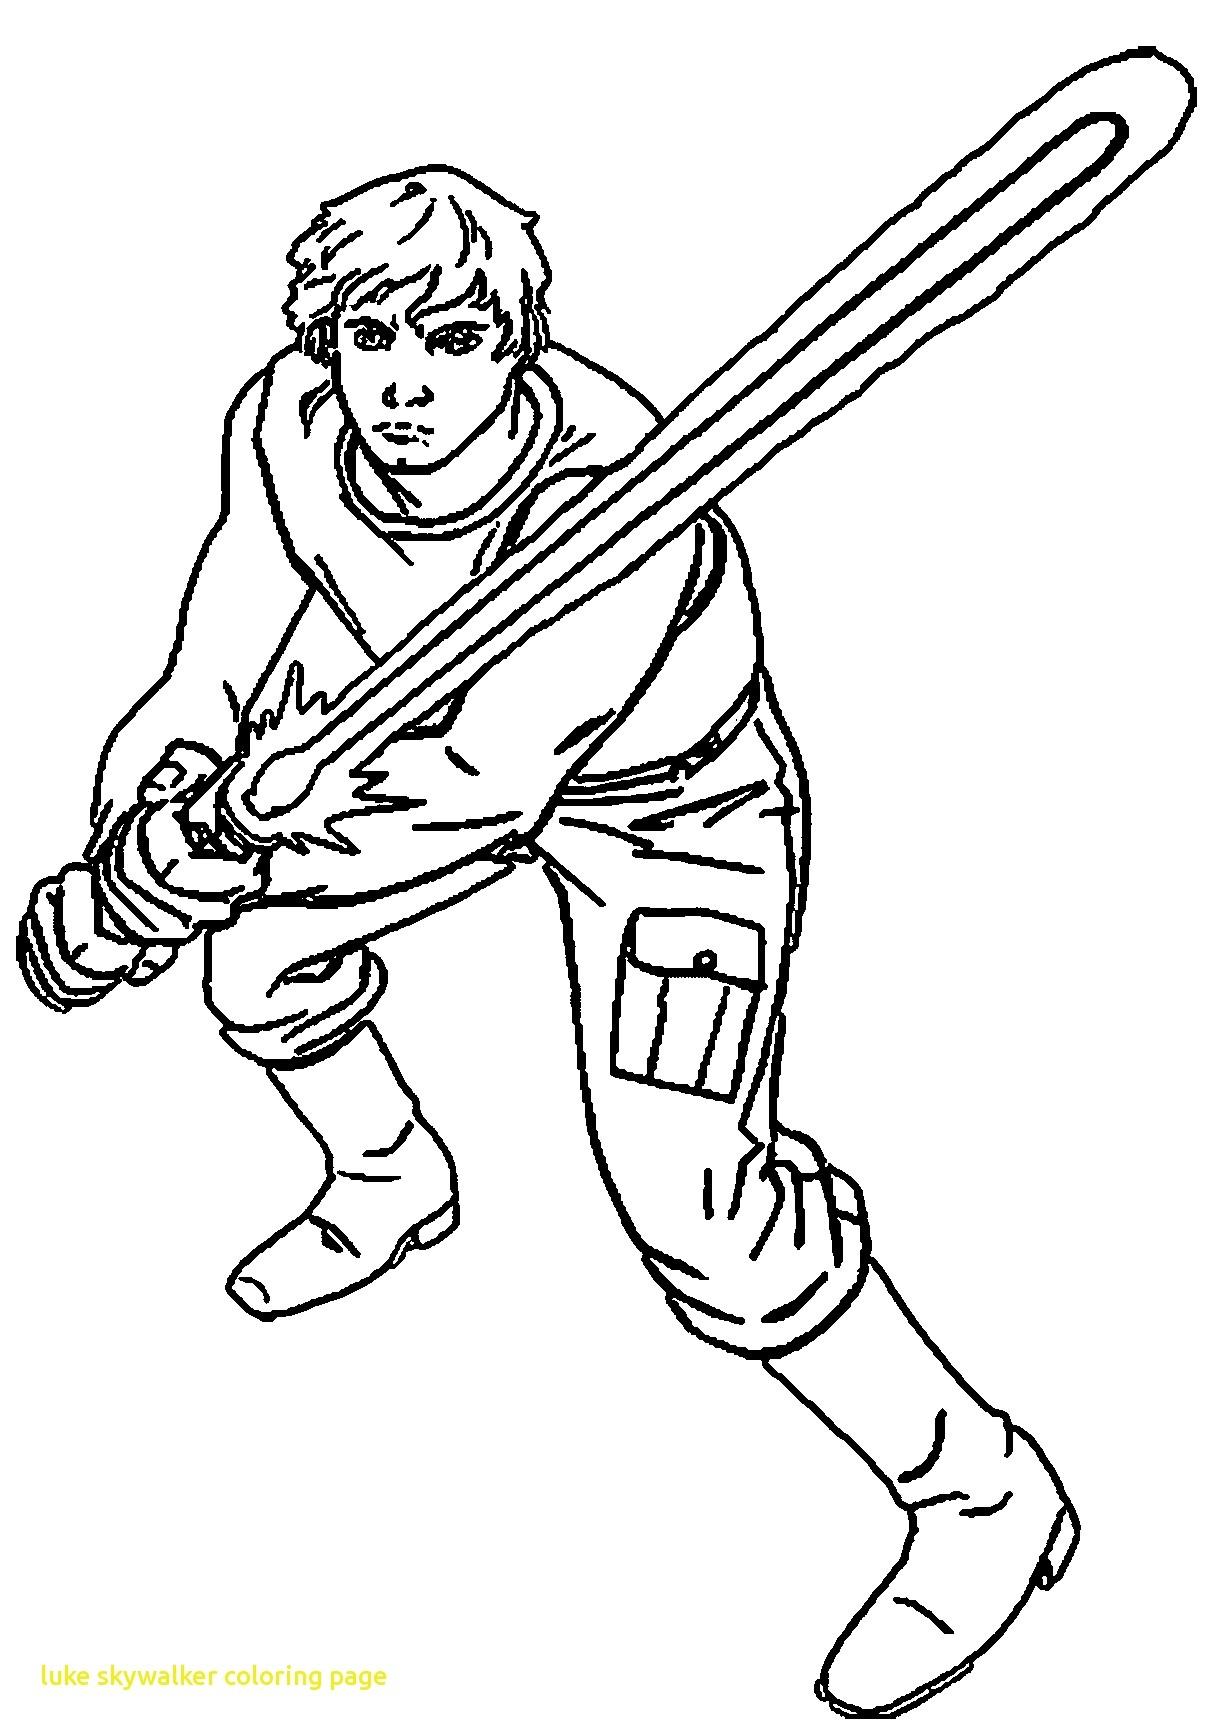 1228x1733 Luke Skywalker Coloring Page With Luke Skywalker Coloring Page